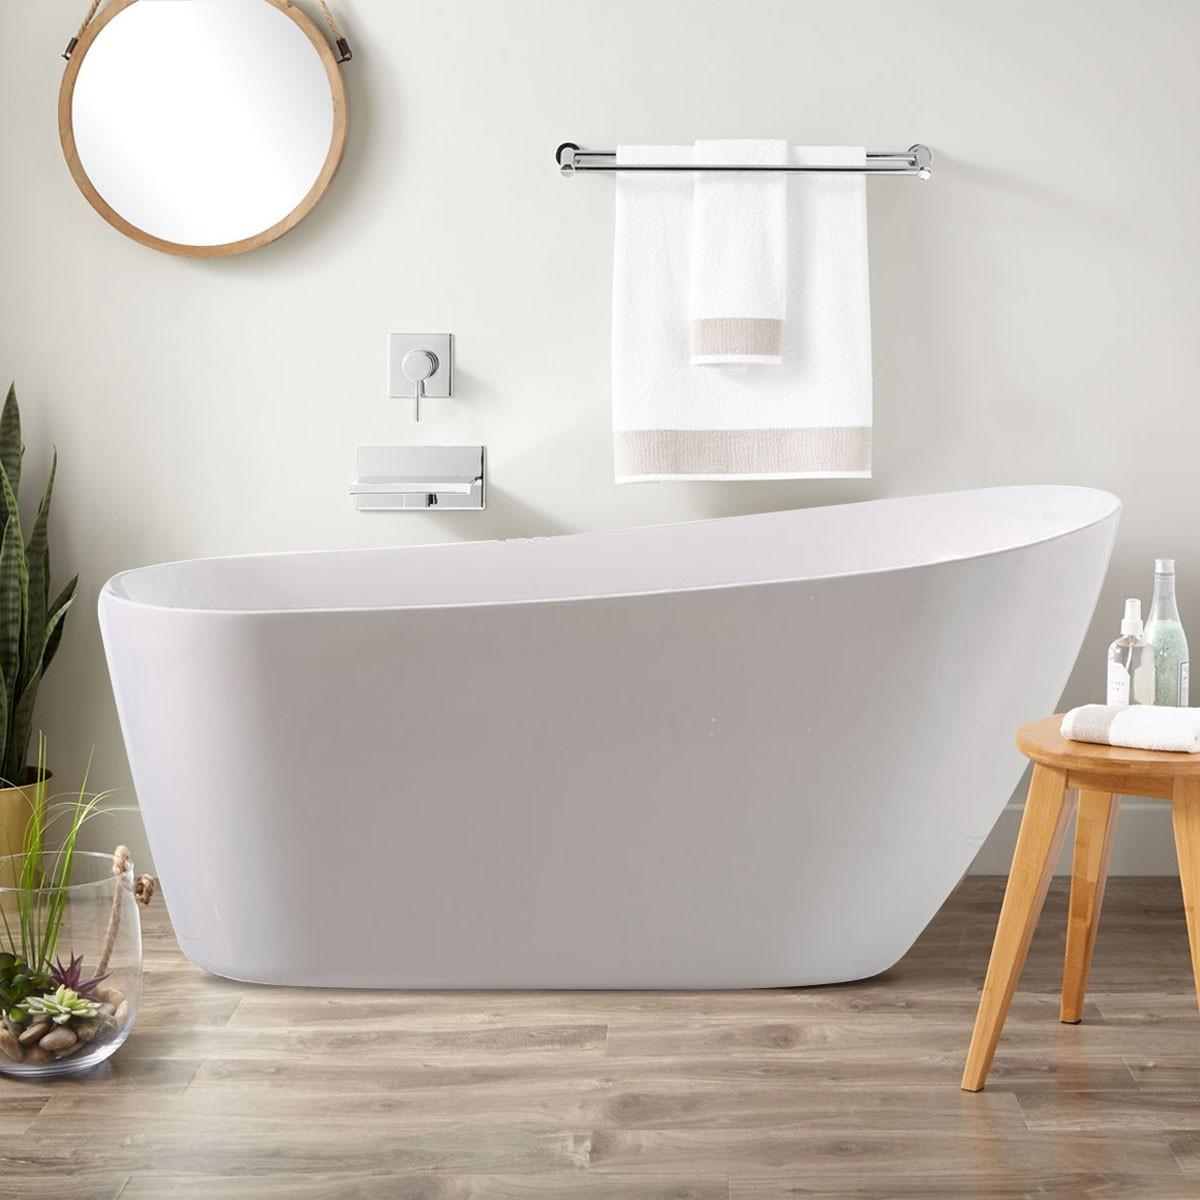 67 In Freestanding Bathtub - Acrylic Pure White (DK-PW-K33778)